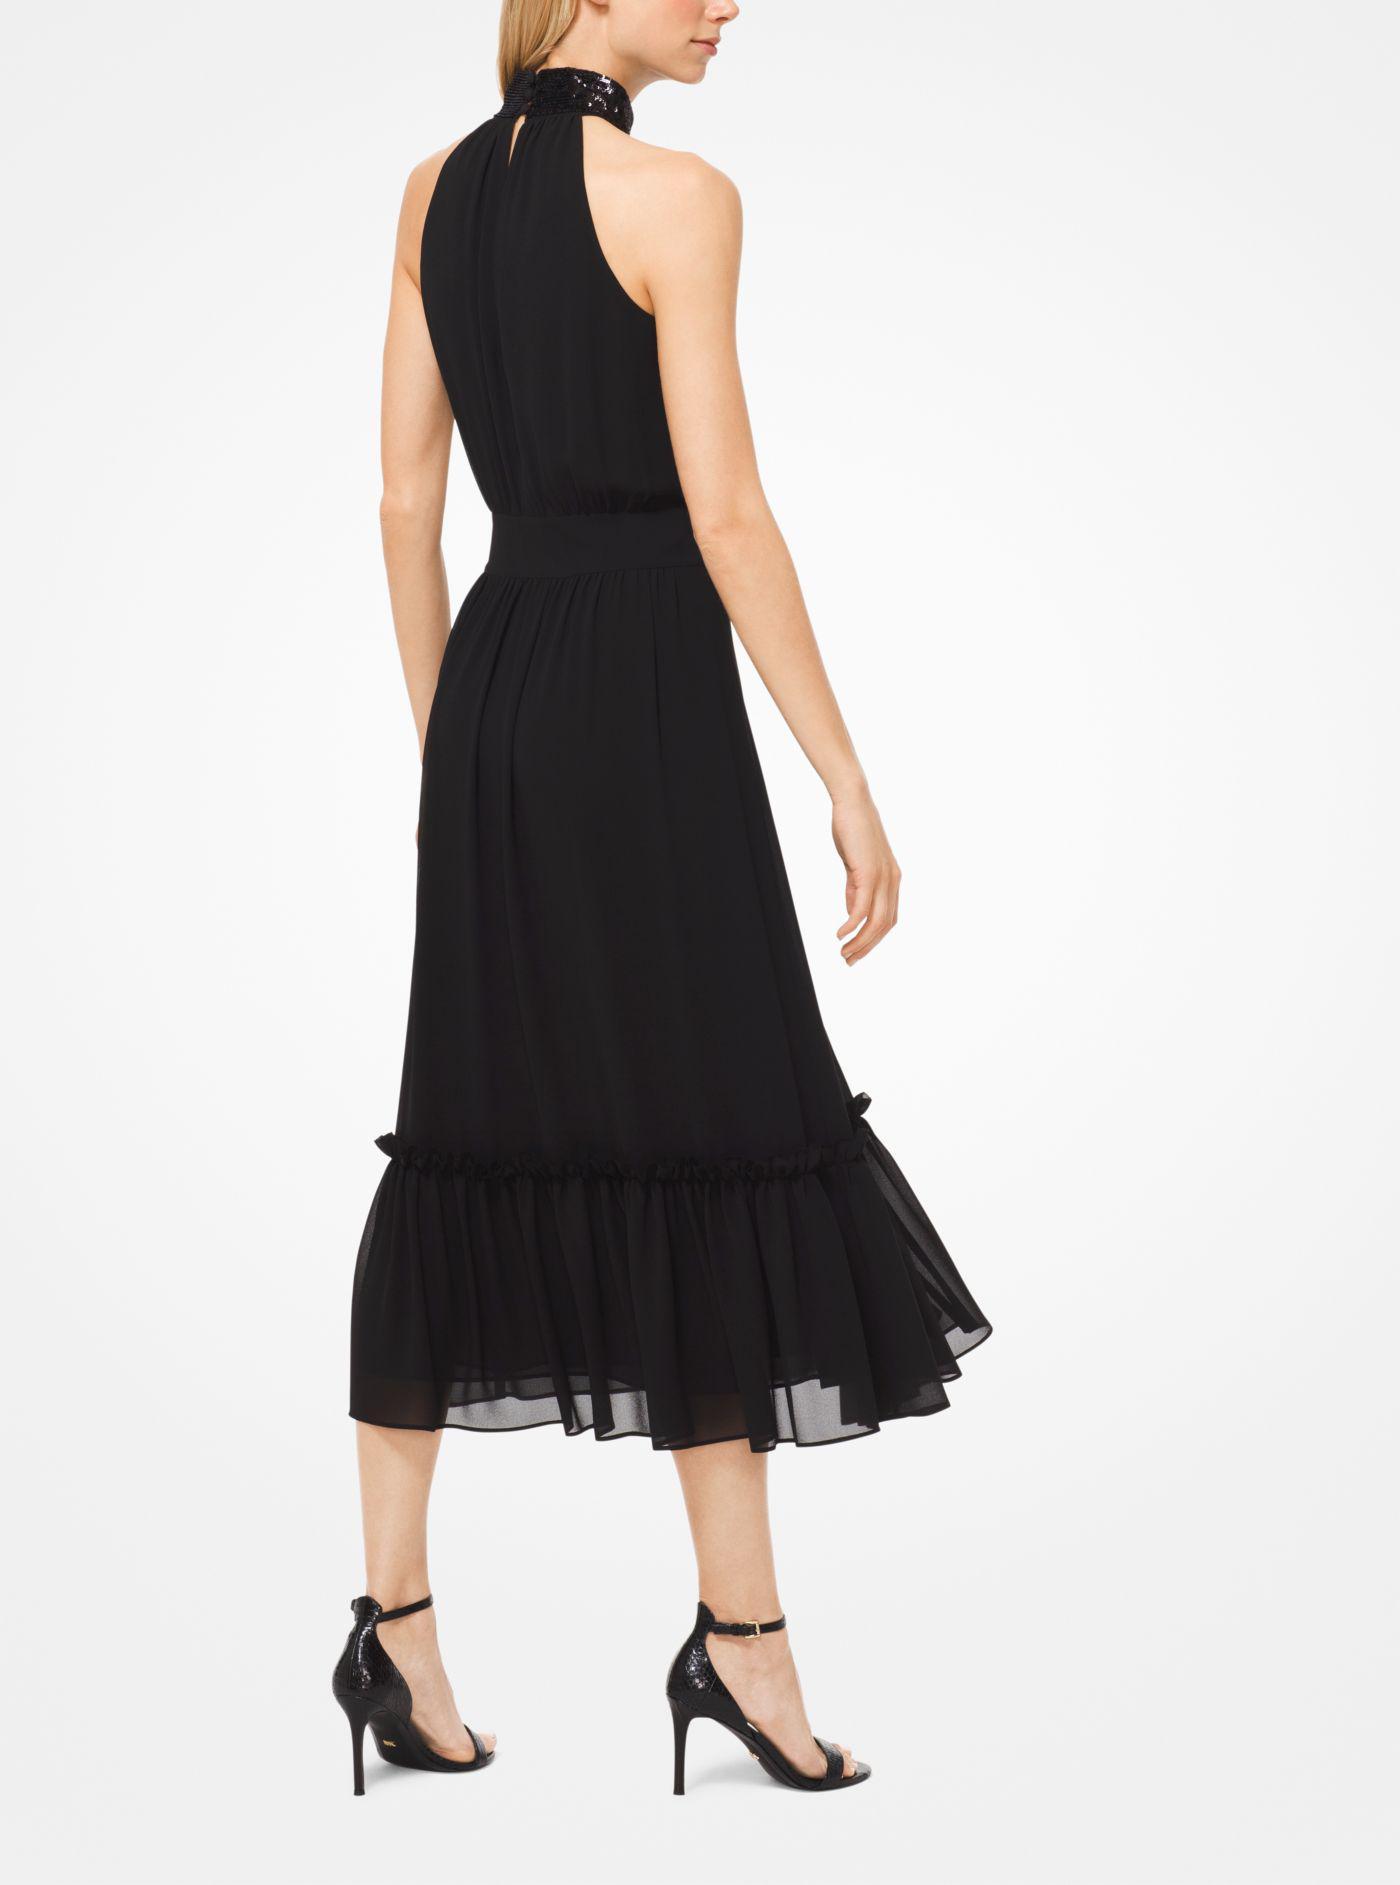 a498ee4db7 Lyst - Michael Kors Sequined Georgette Halter Dress in Black